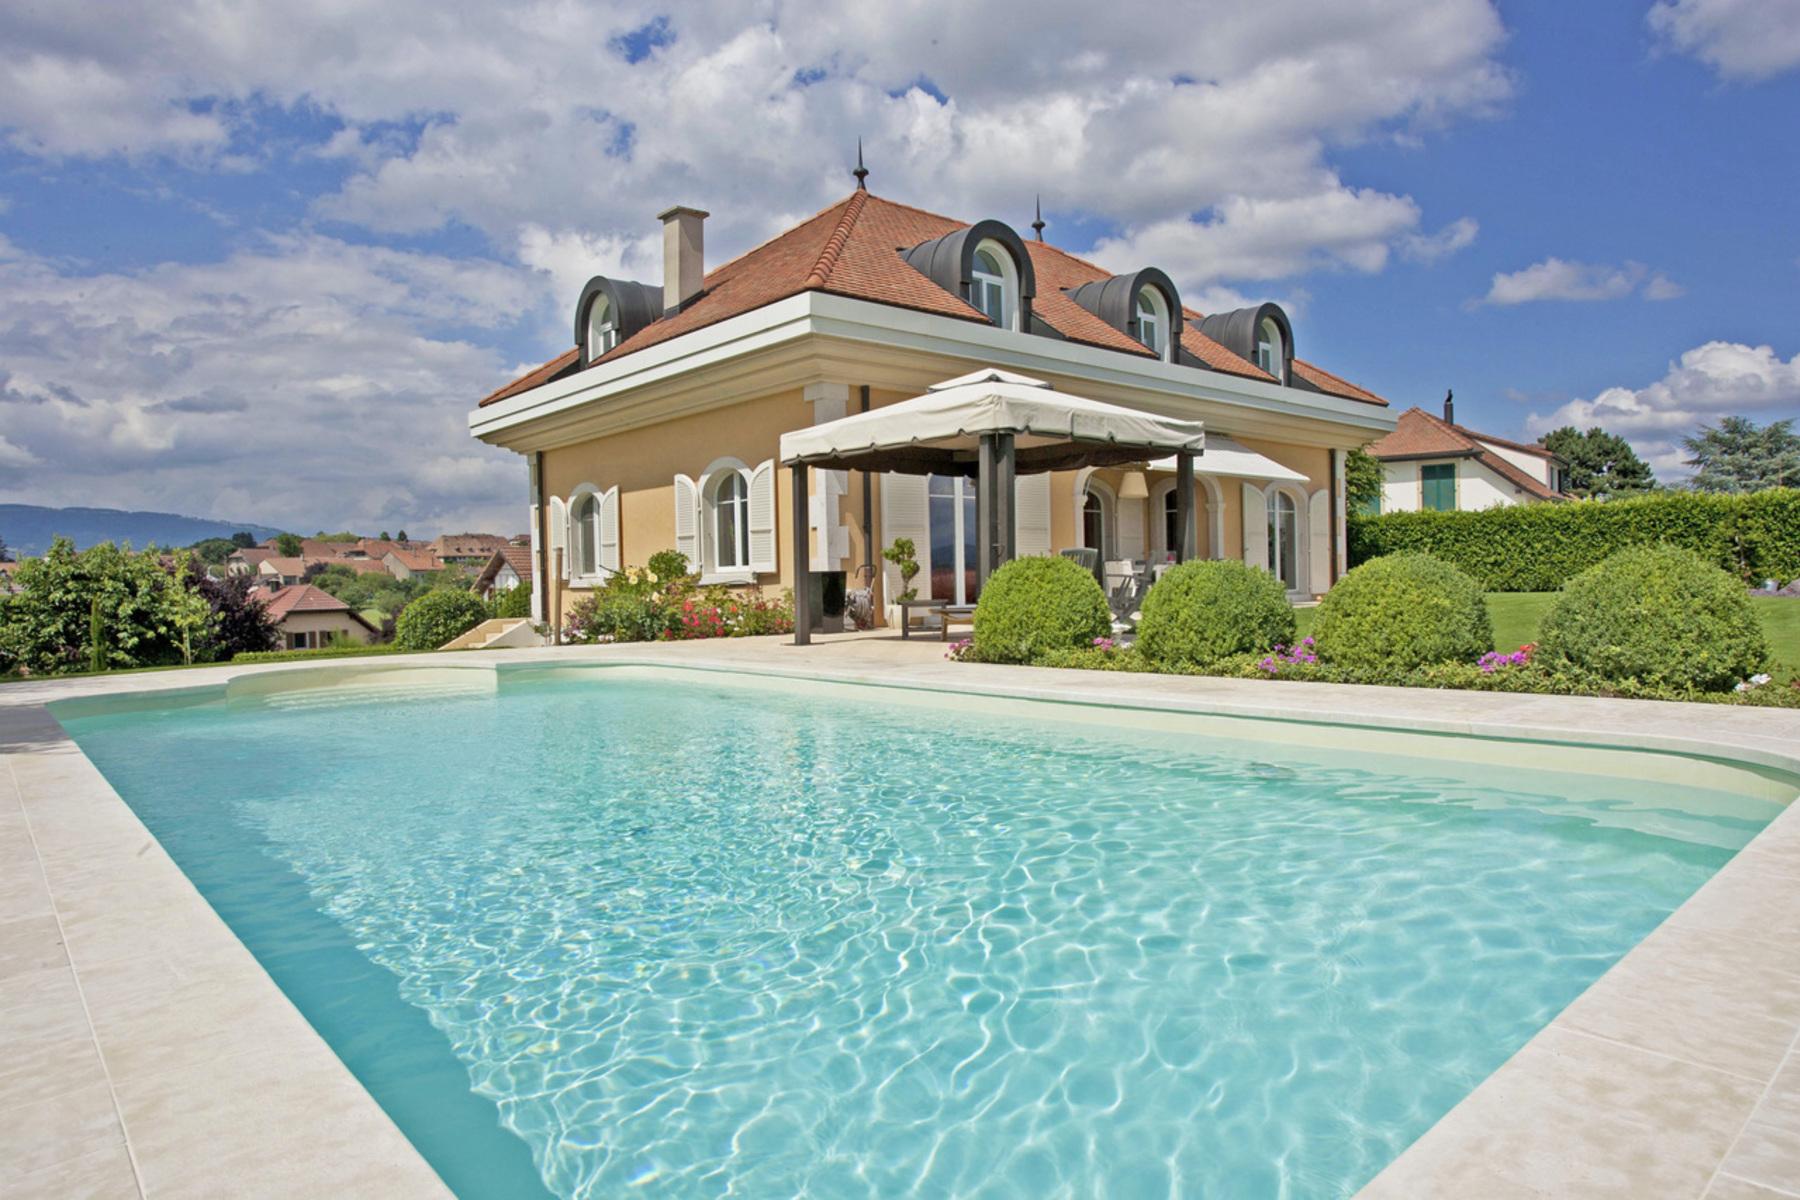 sales property at For sale, Single family house, 1304 Senarclens, Réf 8365